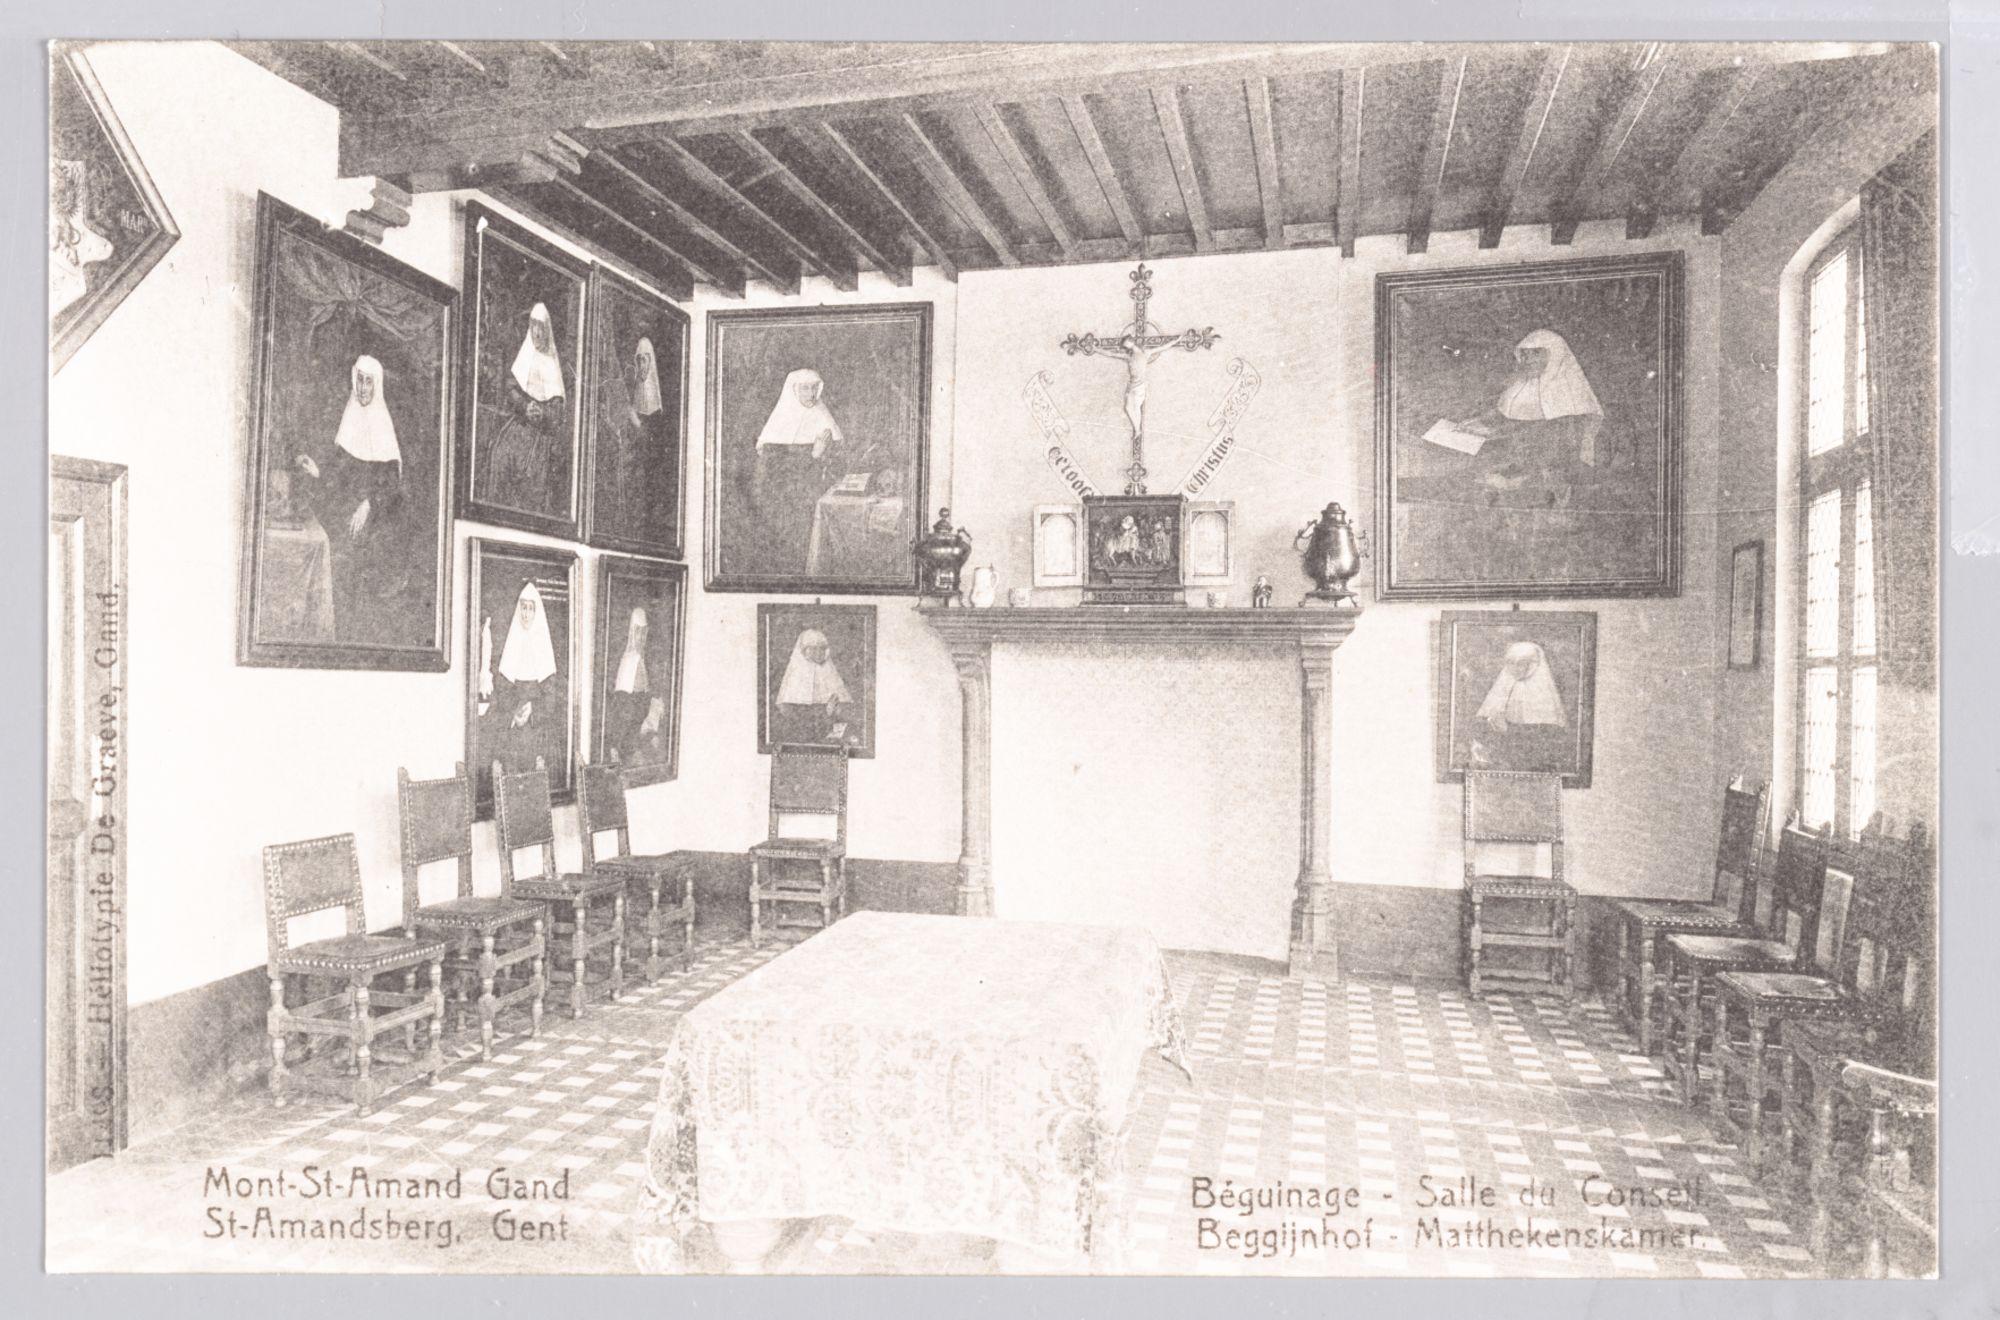 Sint-Amandsberg: Groot Begijnhof: Matthekenskamer (raadszaal)